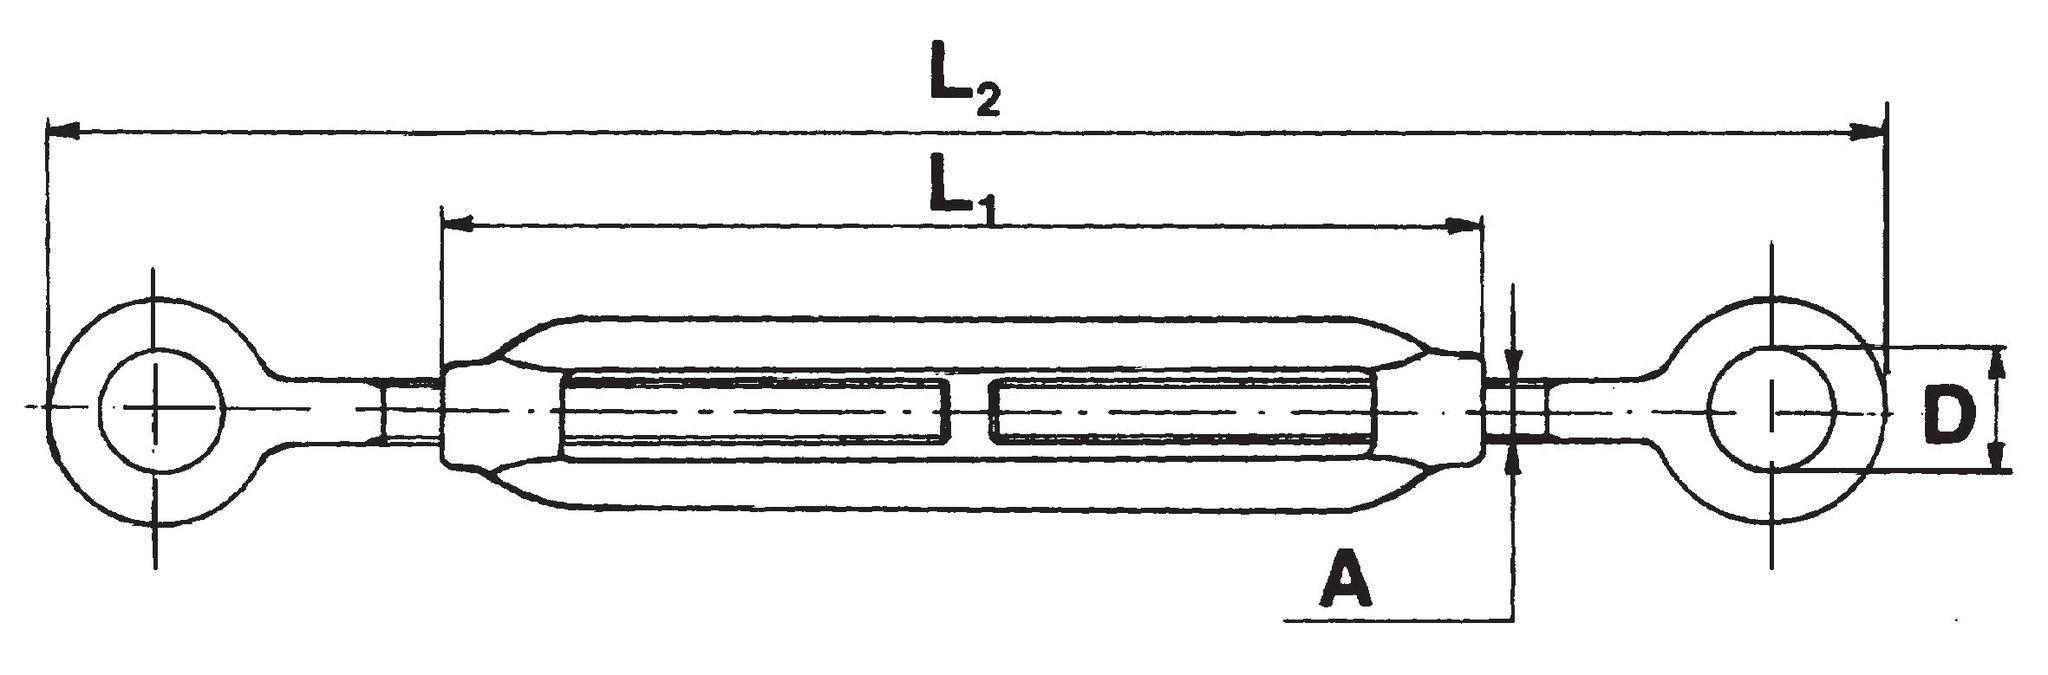 Tenditore a 2 occhi INOX mm 10 AISI 316